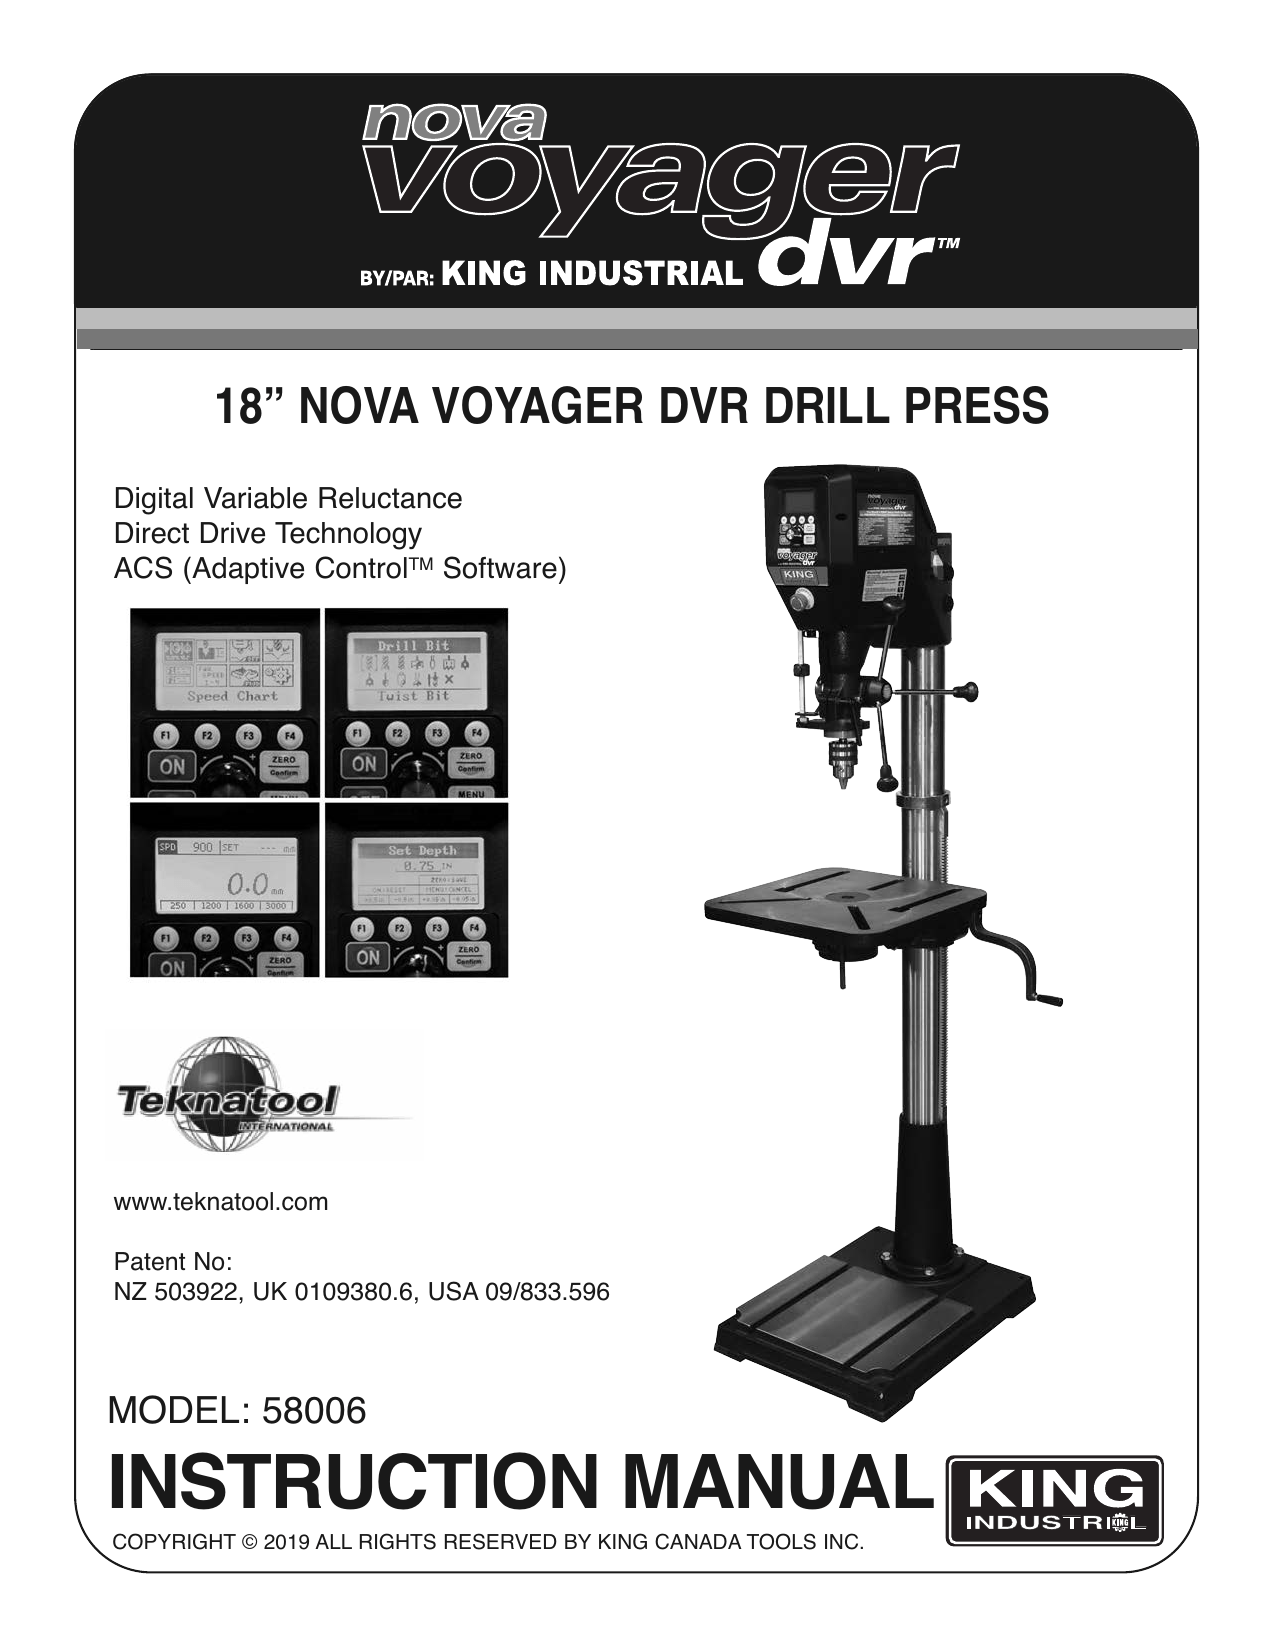 King Canada 58006 18'' NOVA VOYAGER DVR DRILL PRESS